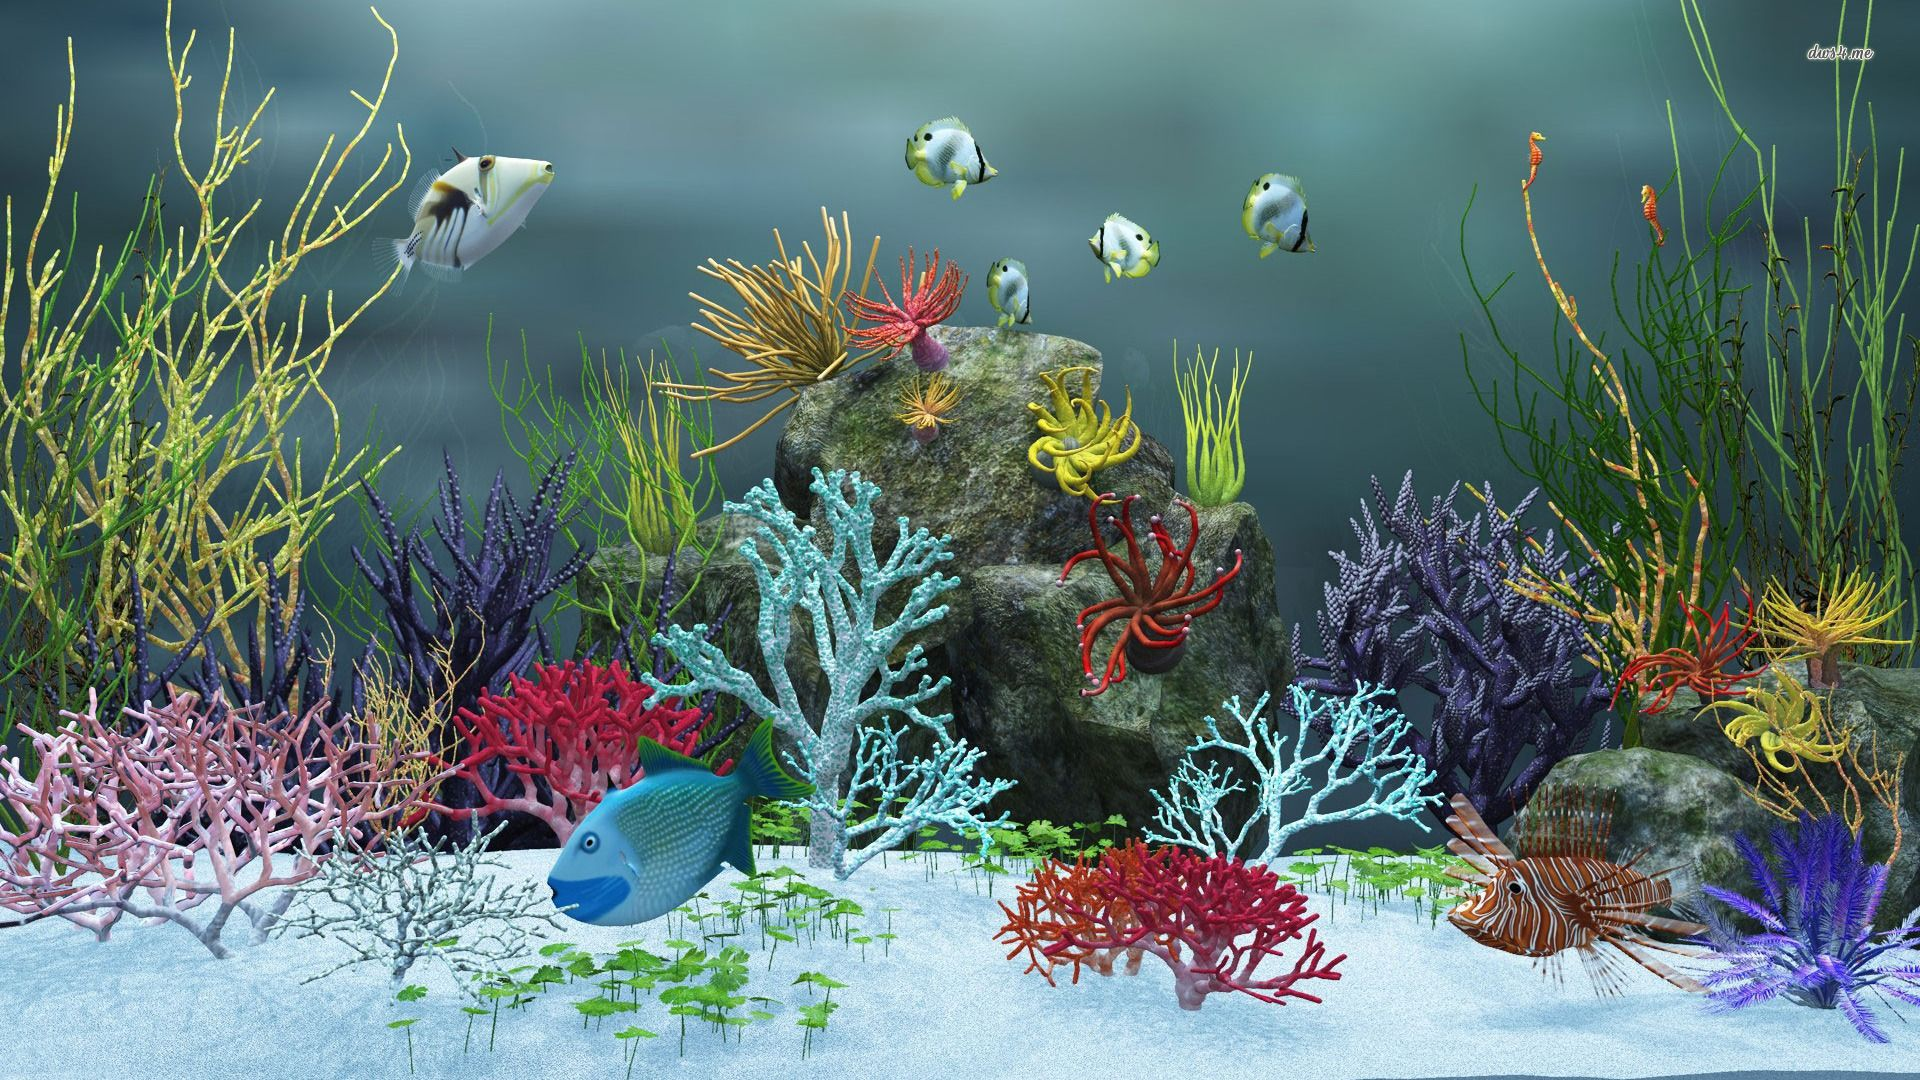 Картинка аквариум заставка